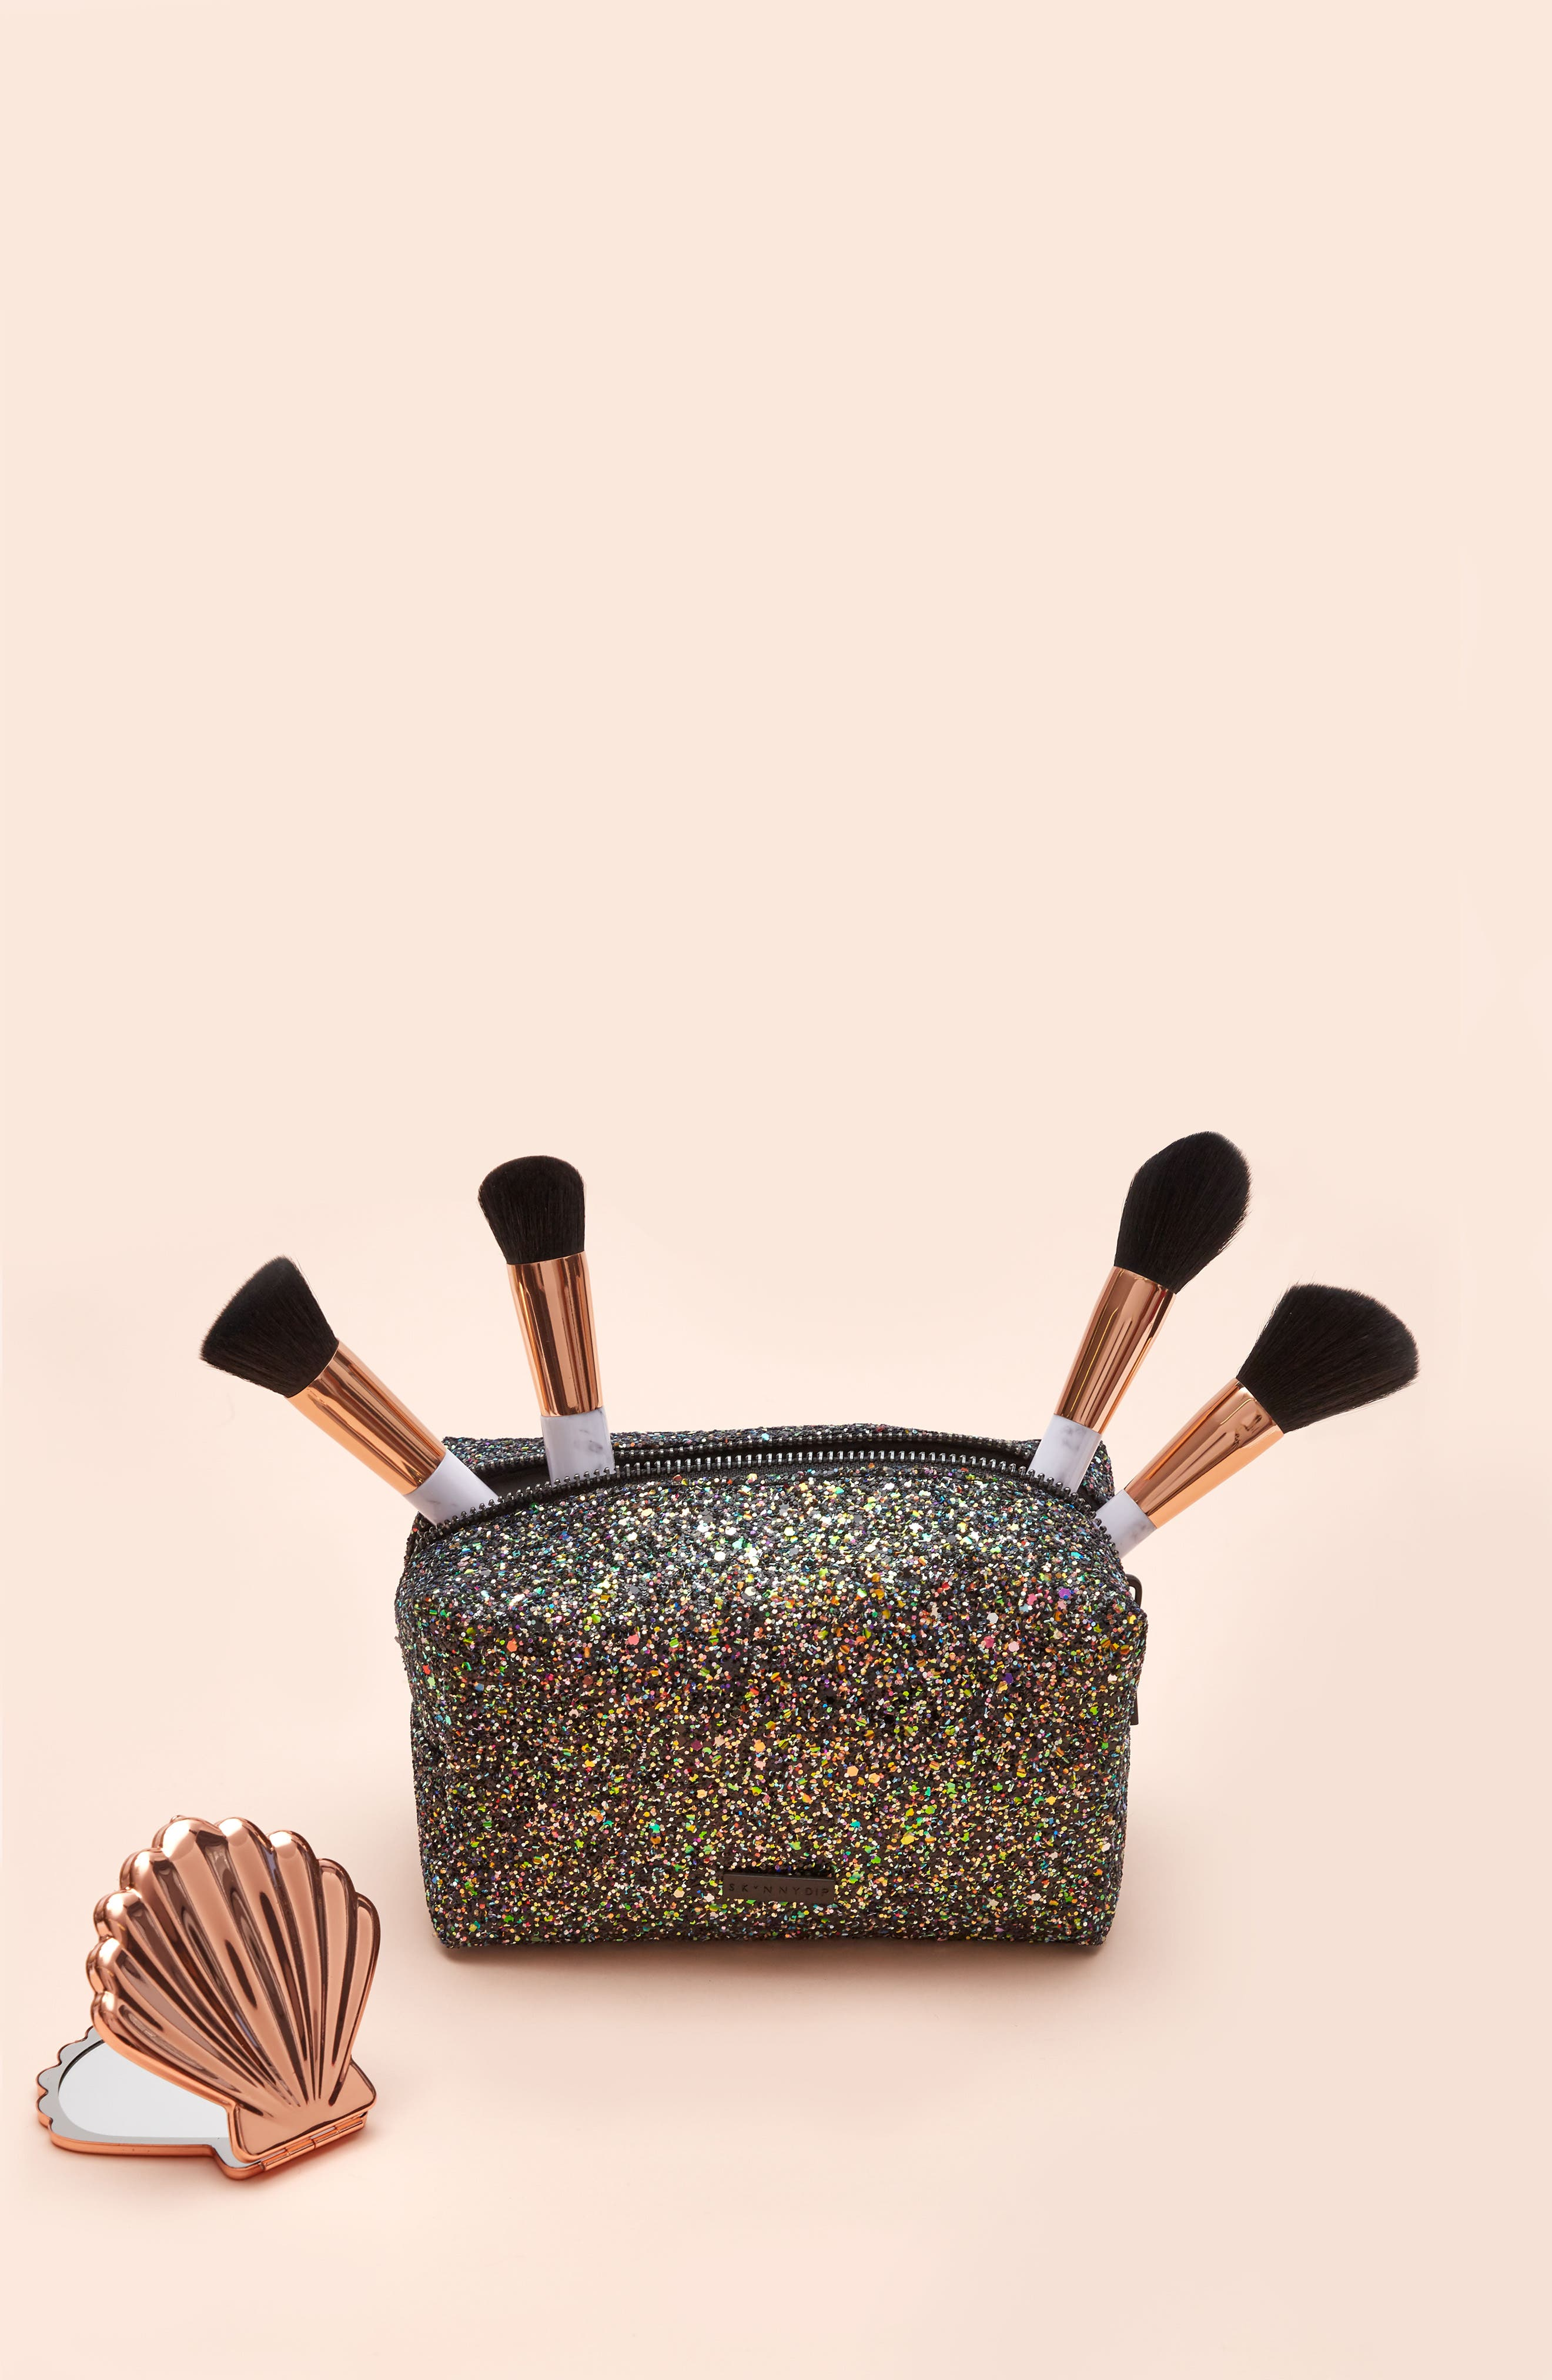 Skinny Dip Liquorice Glitter Cosmetics Bag,                             Alternate thumbnail 6, color,                             No Color